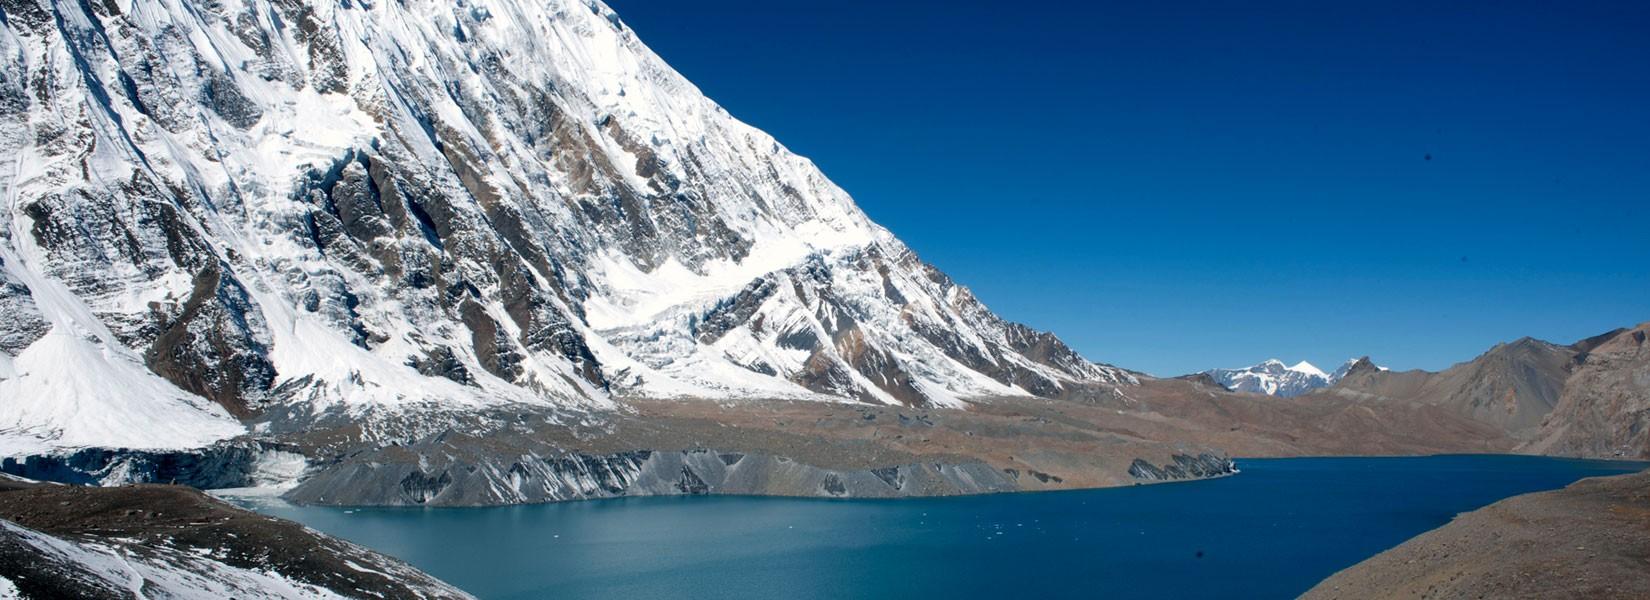 Annapurna Circuit, Thorang La Pass, Ghorepani- Poon-Hill Trek.